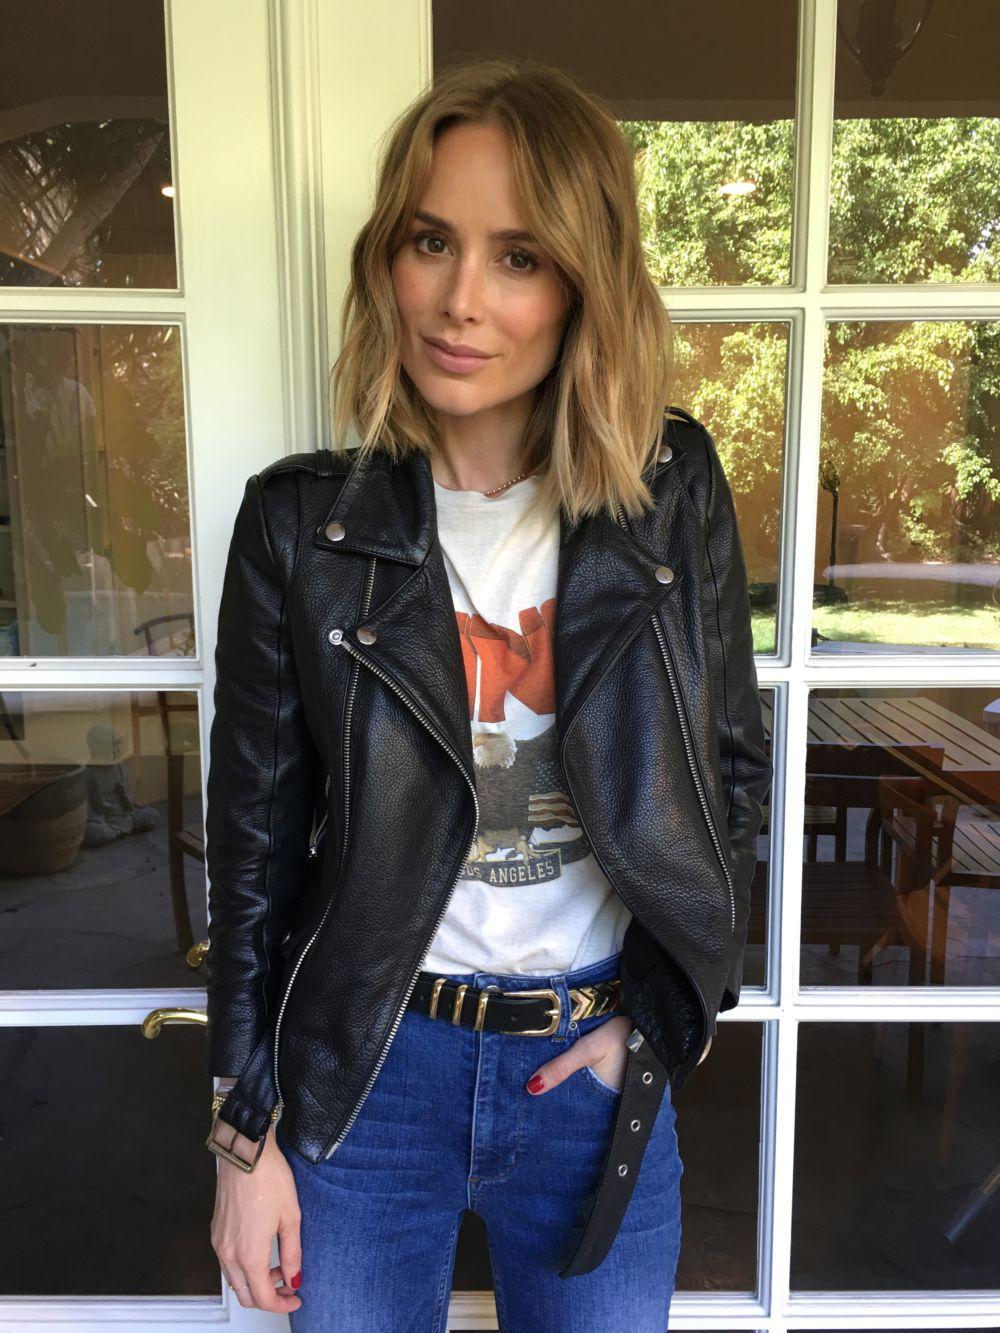 3413d92dd4 ANINE BING cropped moto jacket – ANINE BING vintage bing tee – ANINE BING  metal fishbone belt in gold – ANINE BING jeans with hem detail